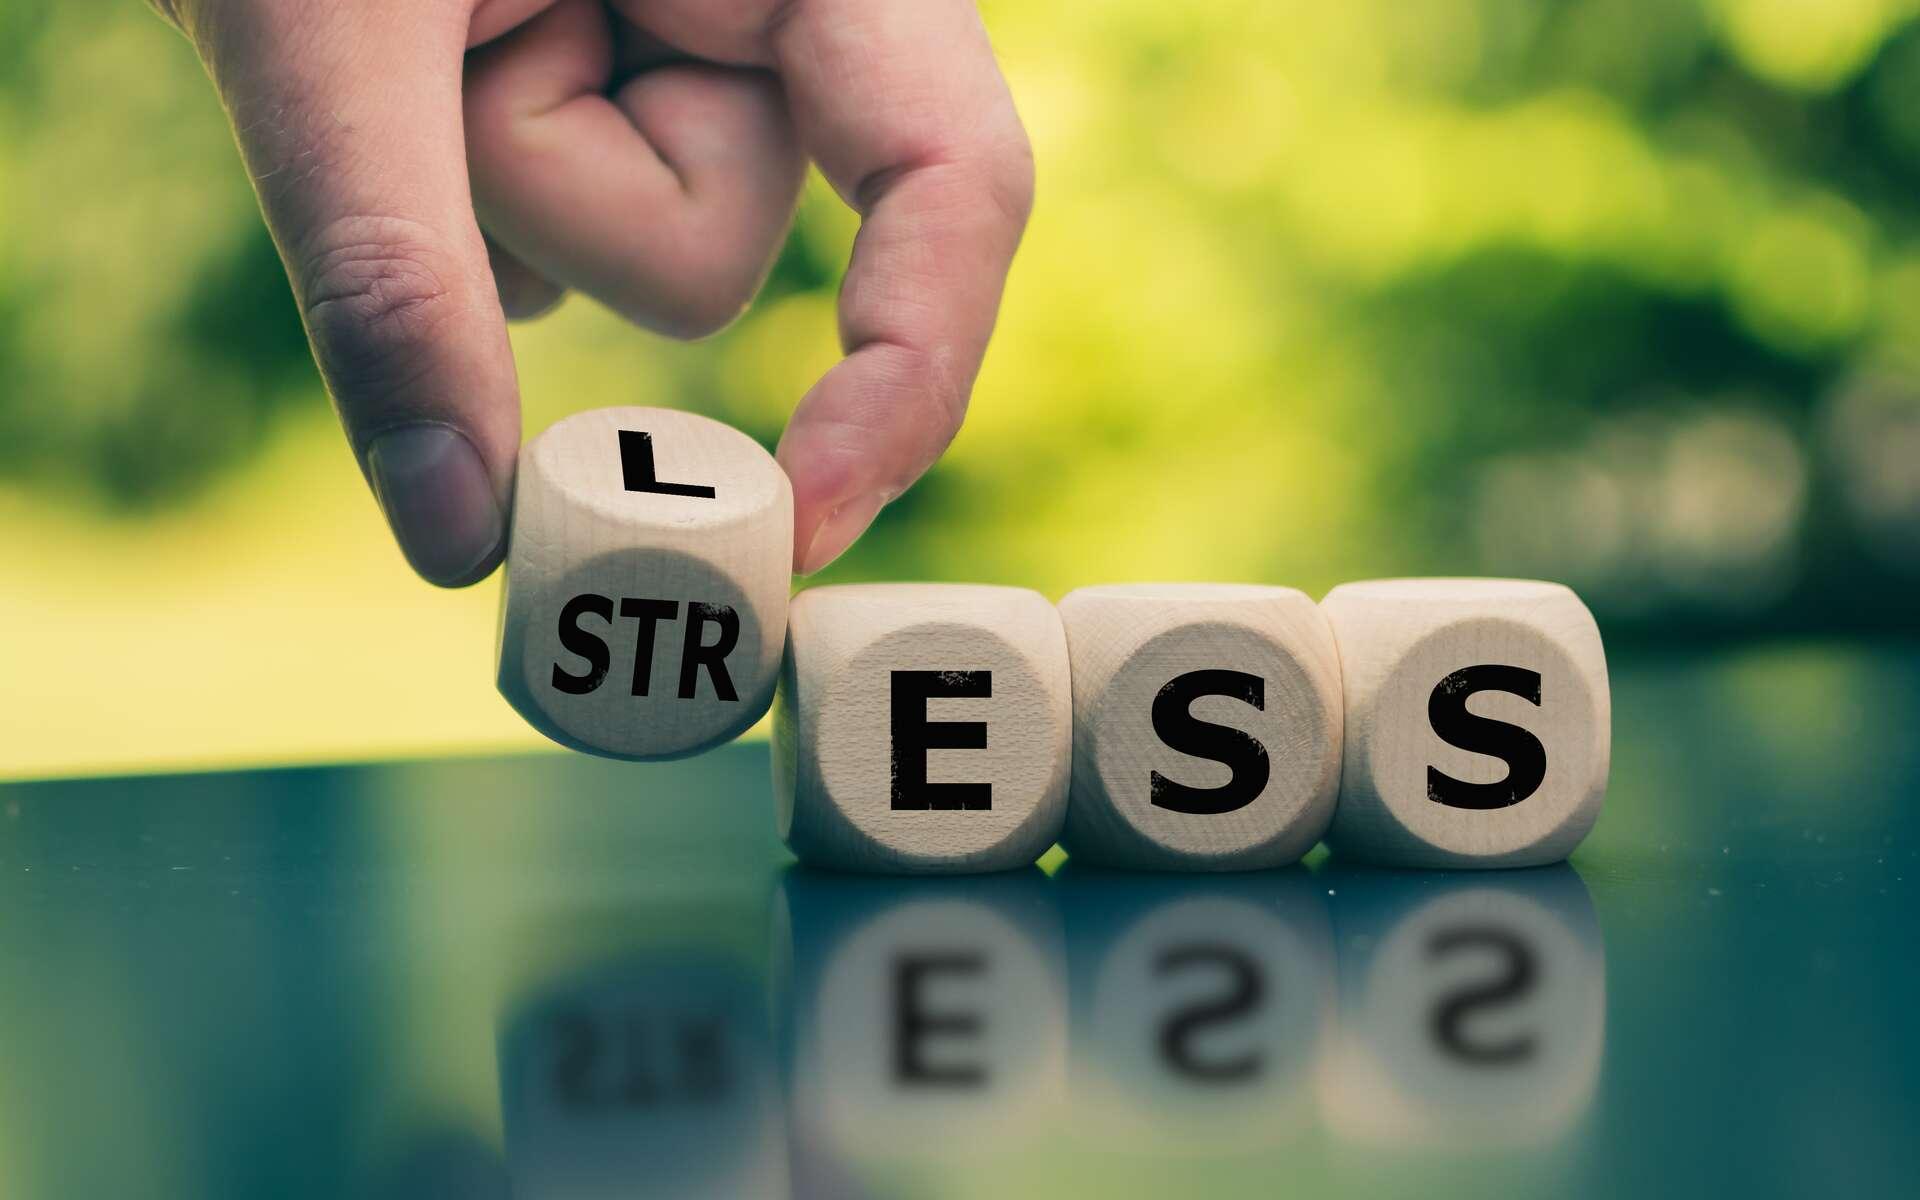 Le stress est un mal insidieux. © Fokussiert, Adobe Stock